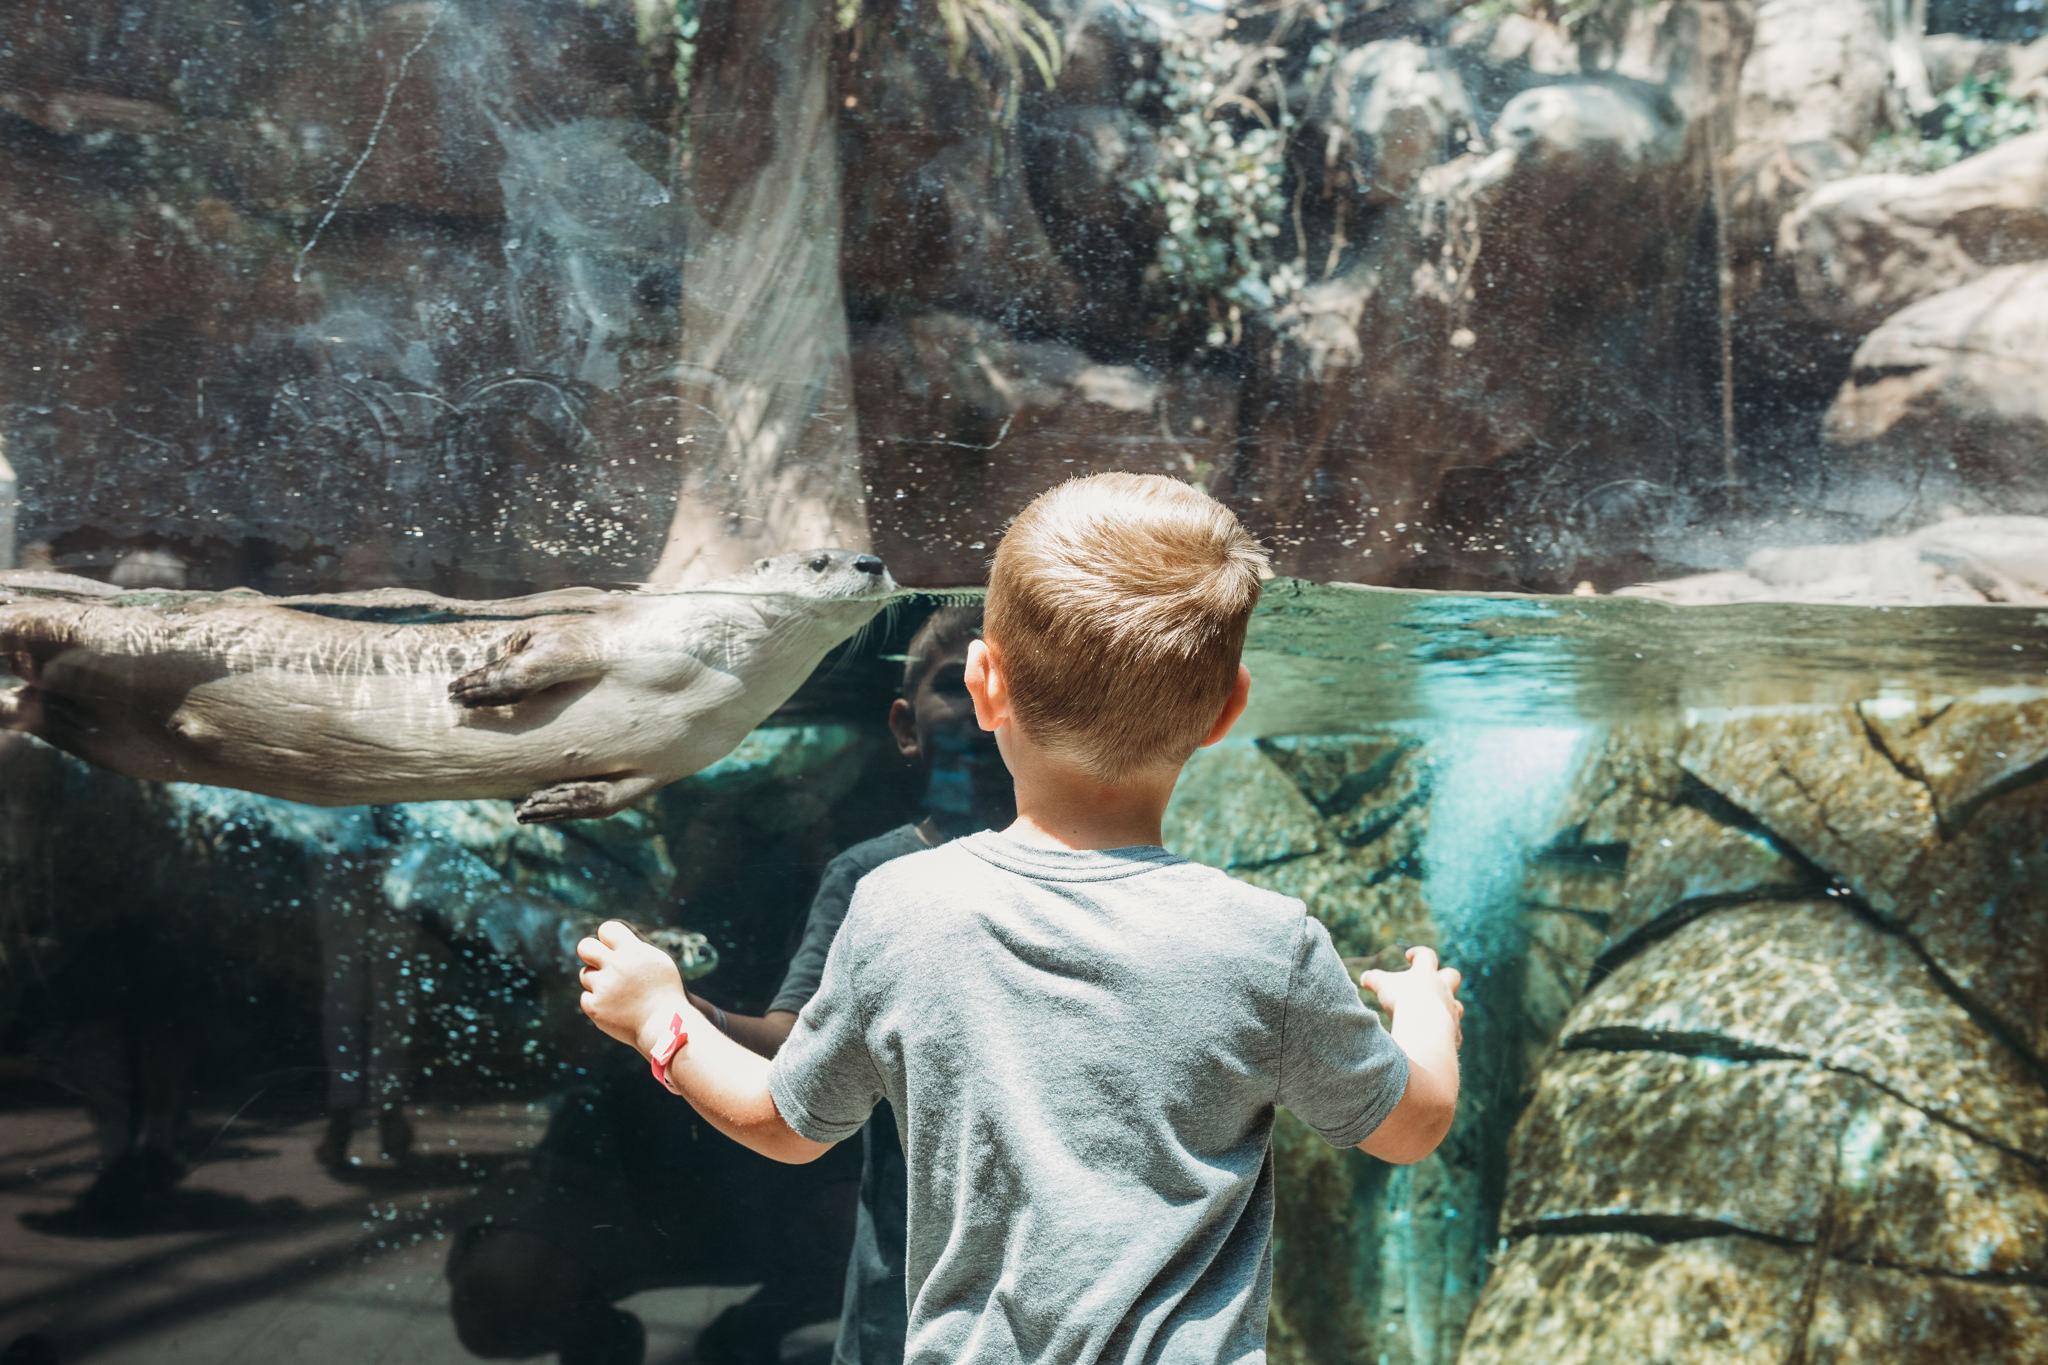 Downtown Aquarium Denver | Rural Life Photography | Mike Wade